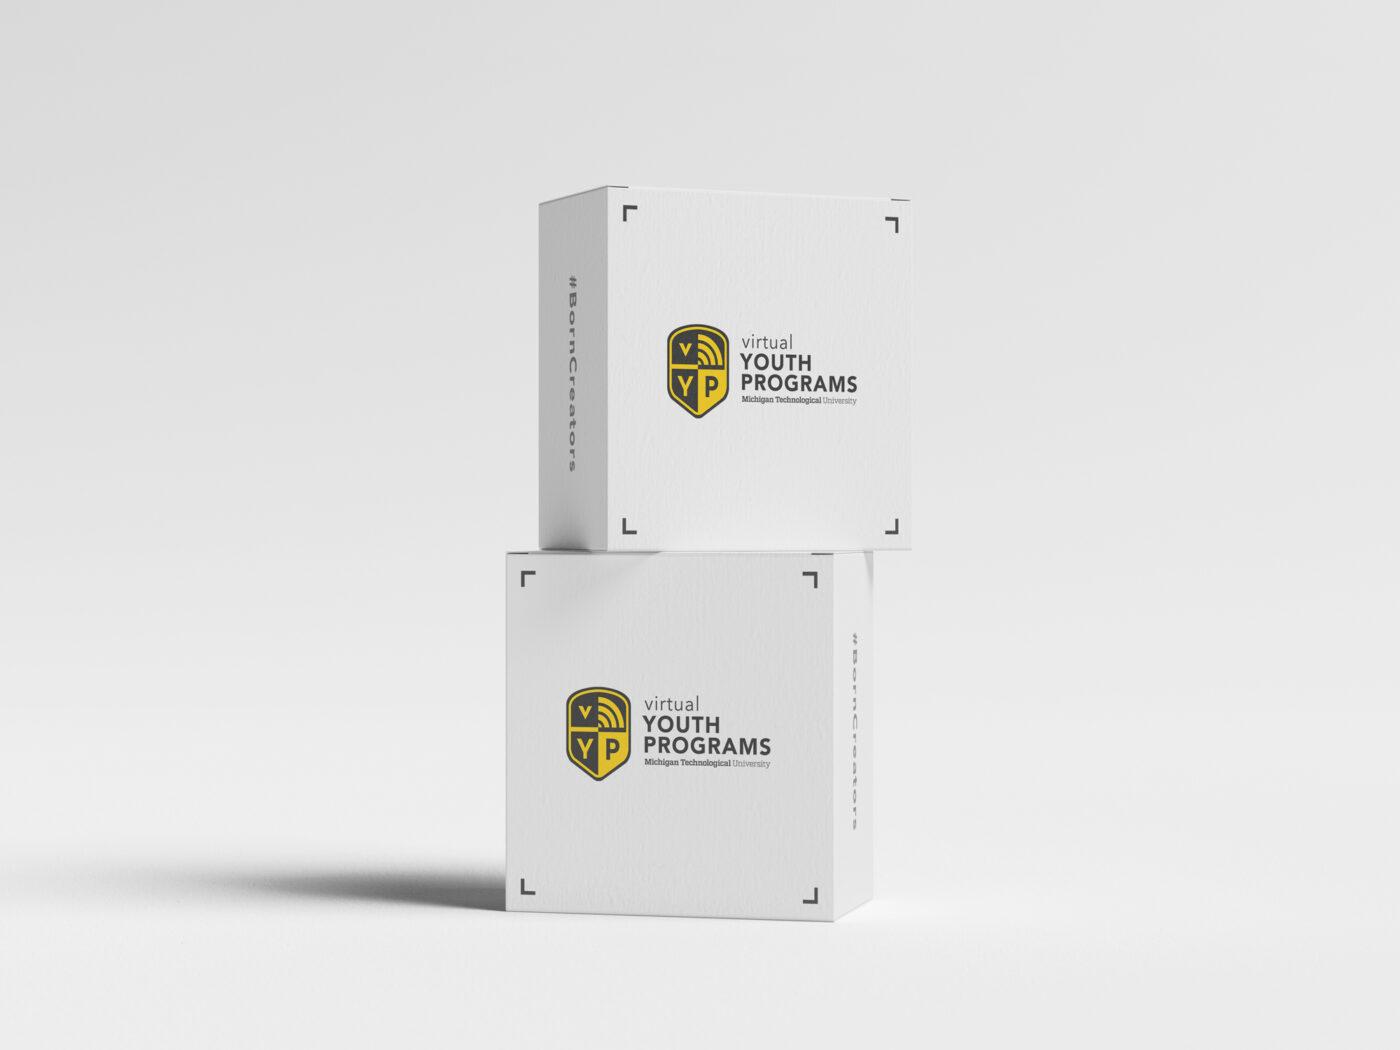 Packaging Design for Michigan Tech virtual Youth Programs